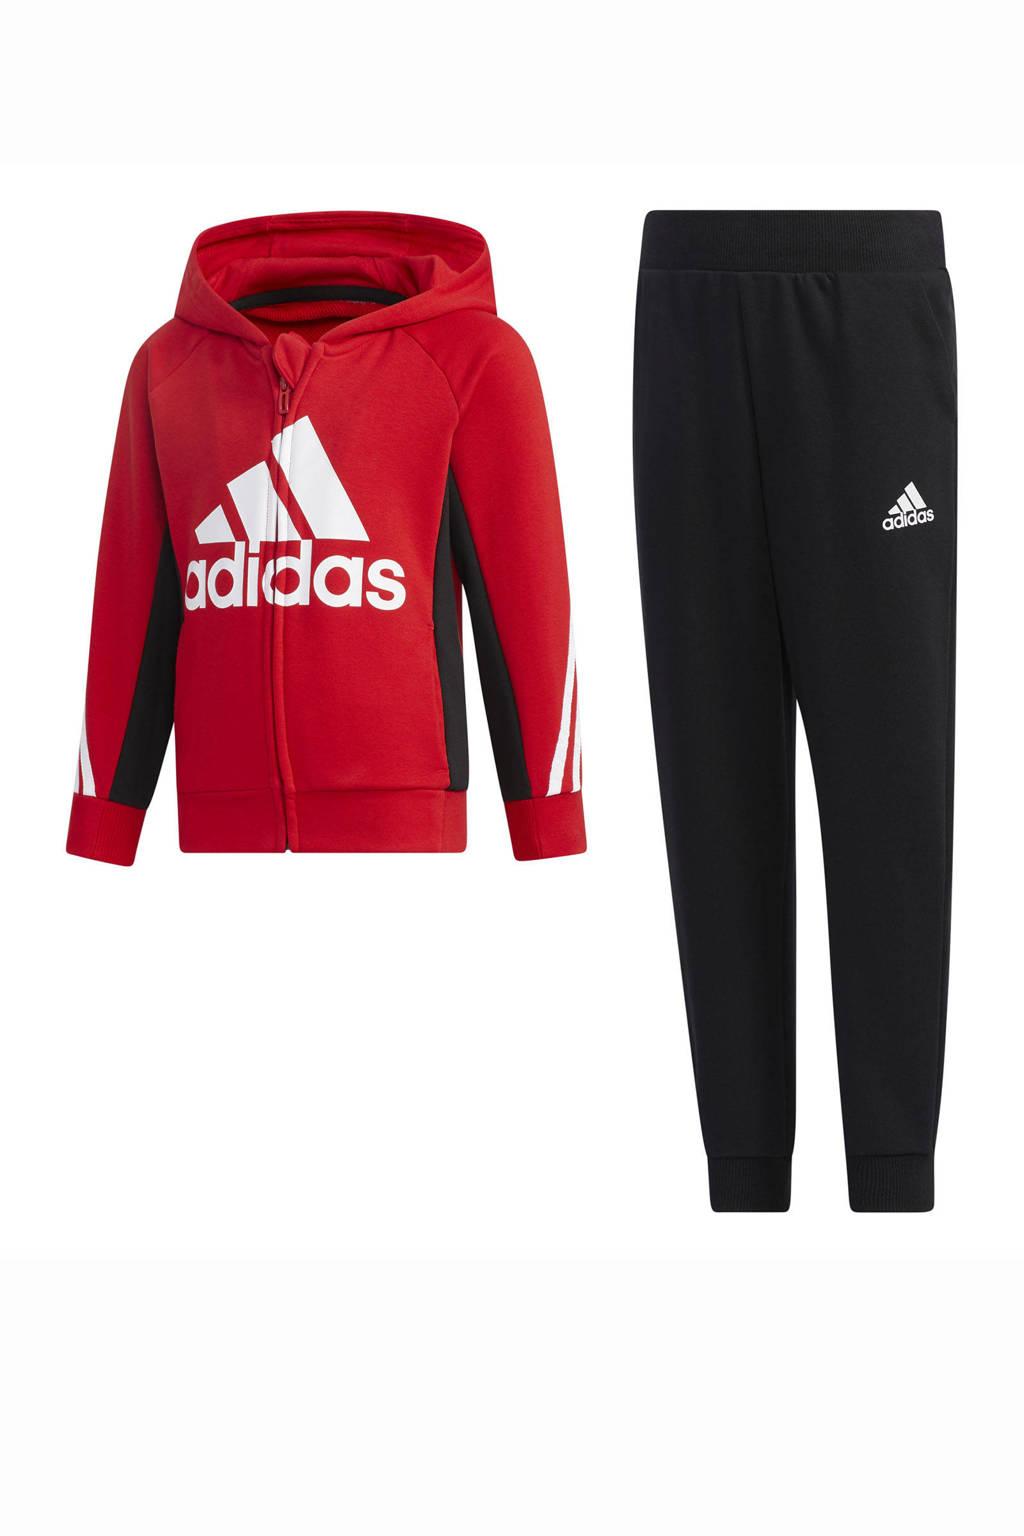 adidas Performance   trainingspak rood/zwart, Rood/zwart